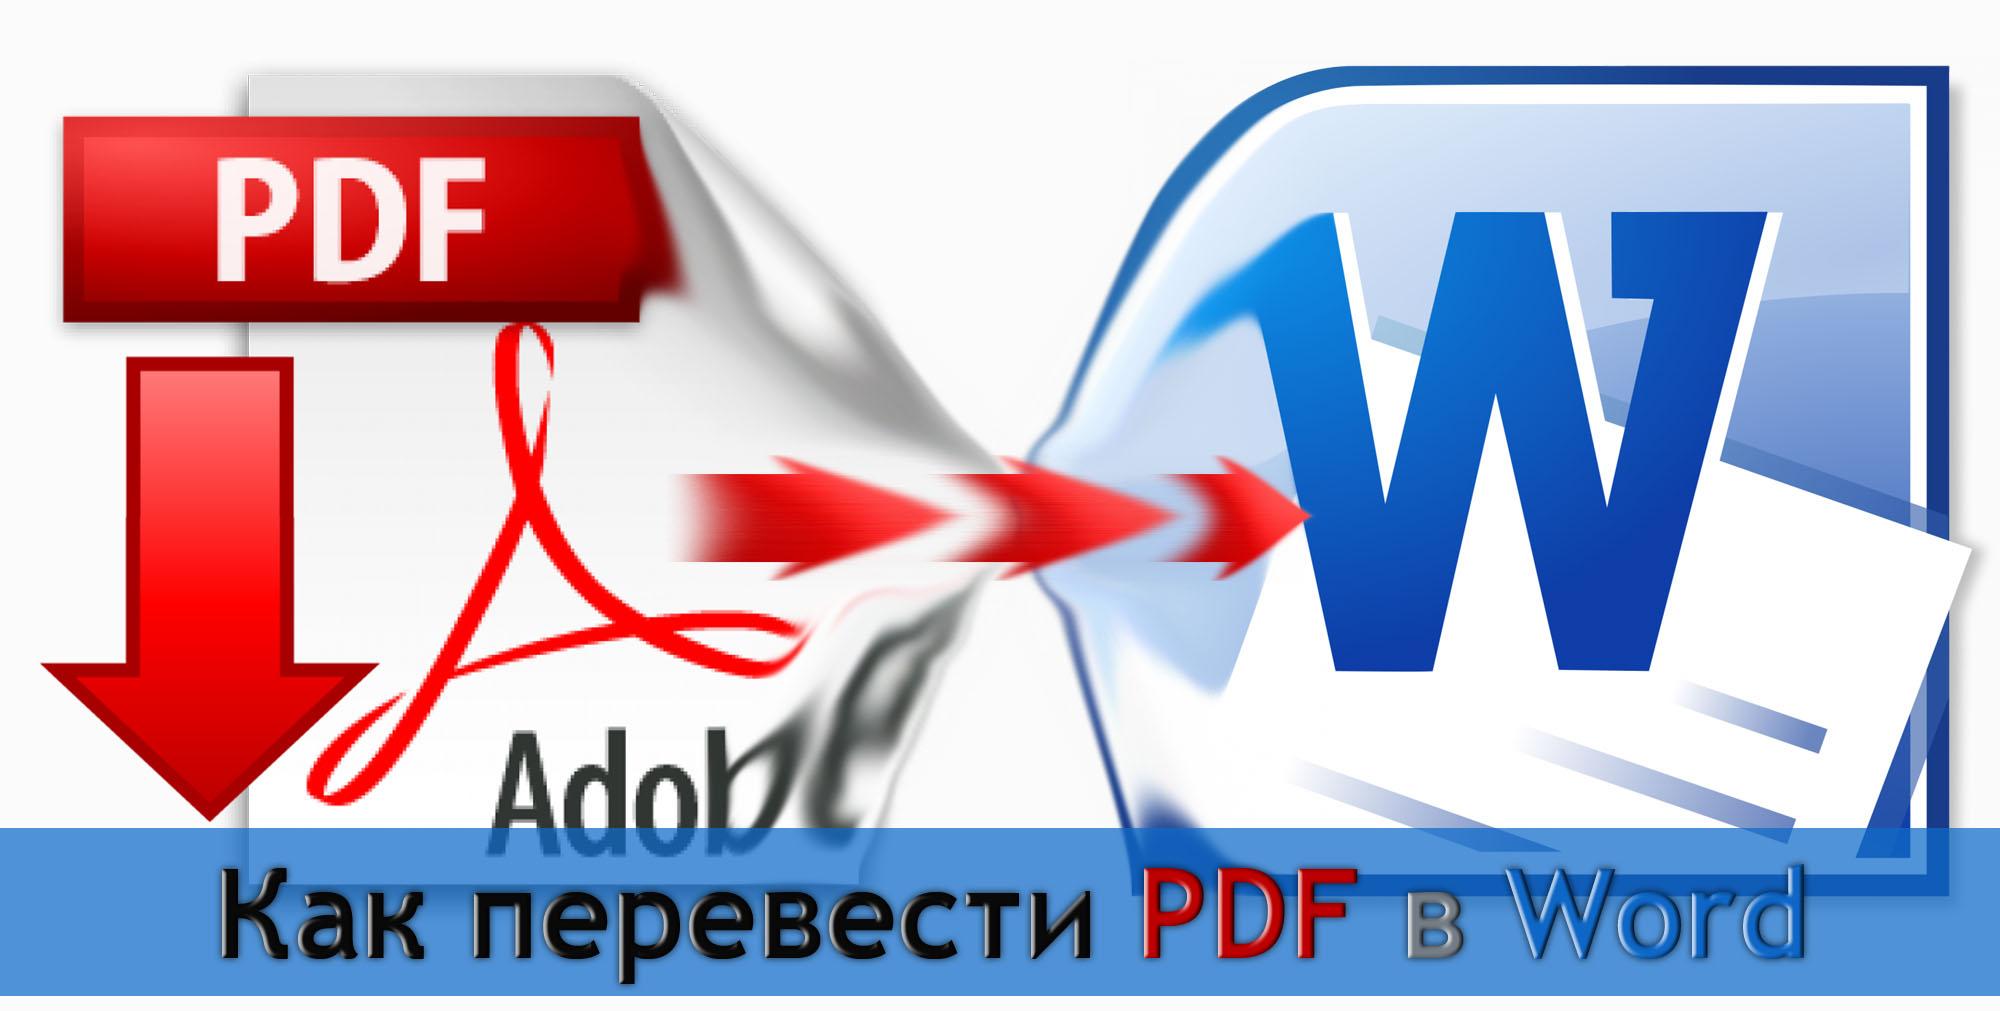 Как перевести PDF в Word